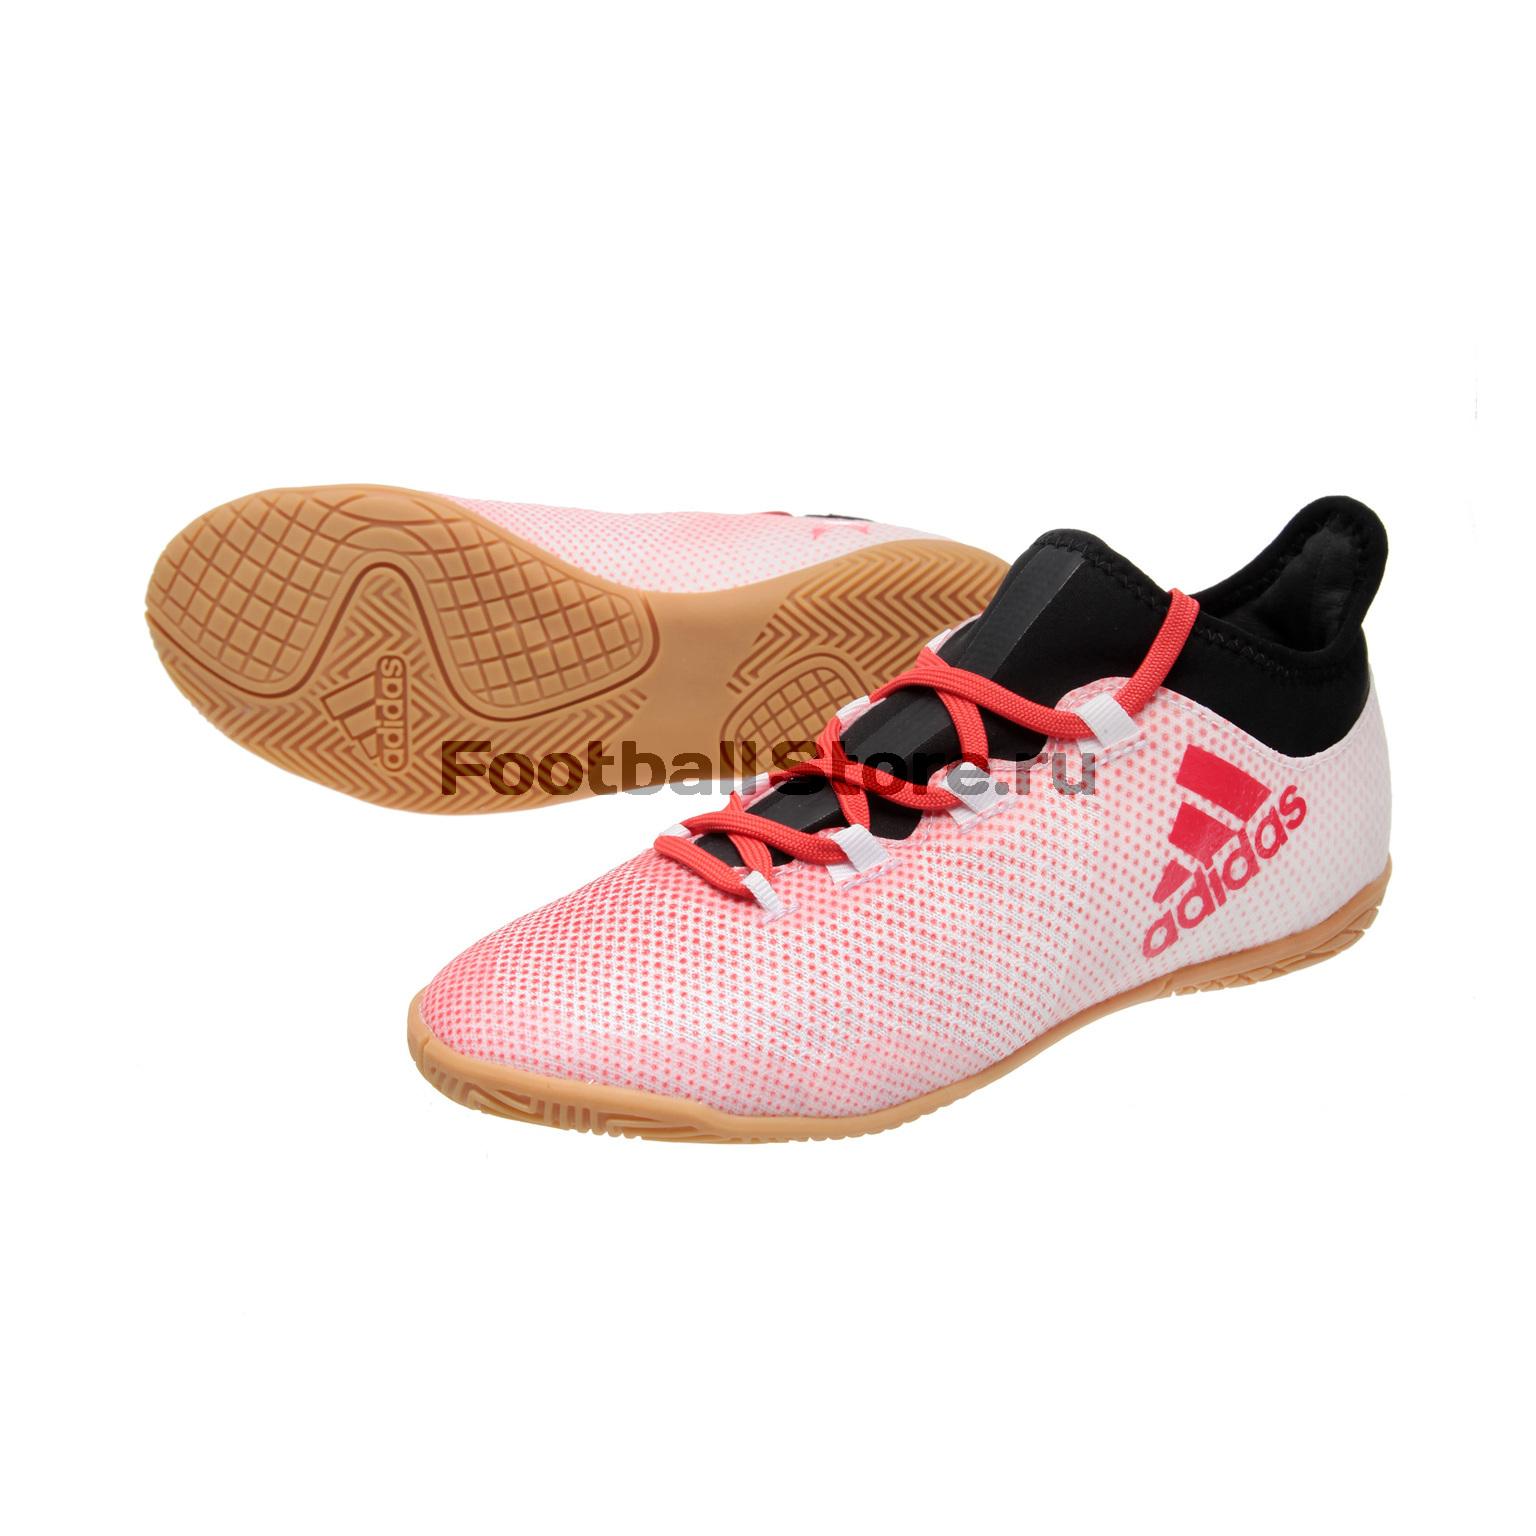 Обувь для зала Adidas X Tango 17.3 IN JR CP9034 обувь для зала adidas ace tango 18 3 in jr cp9075